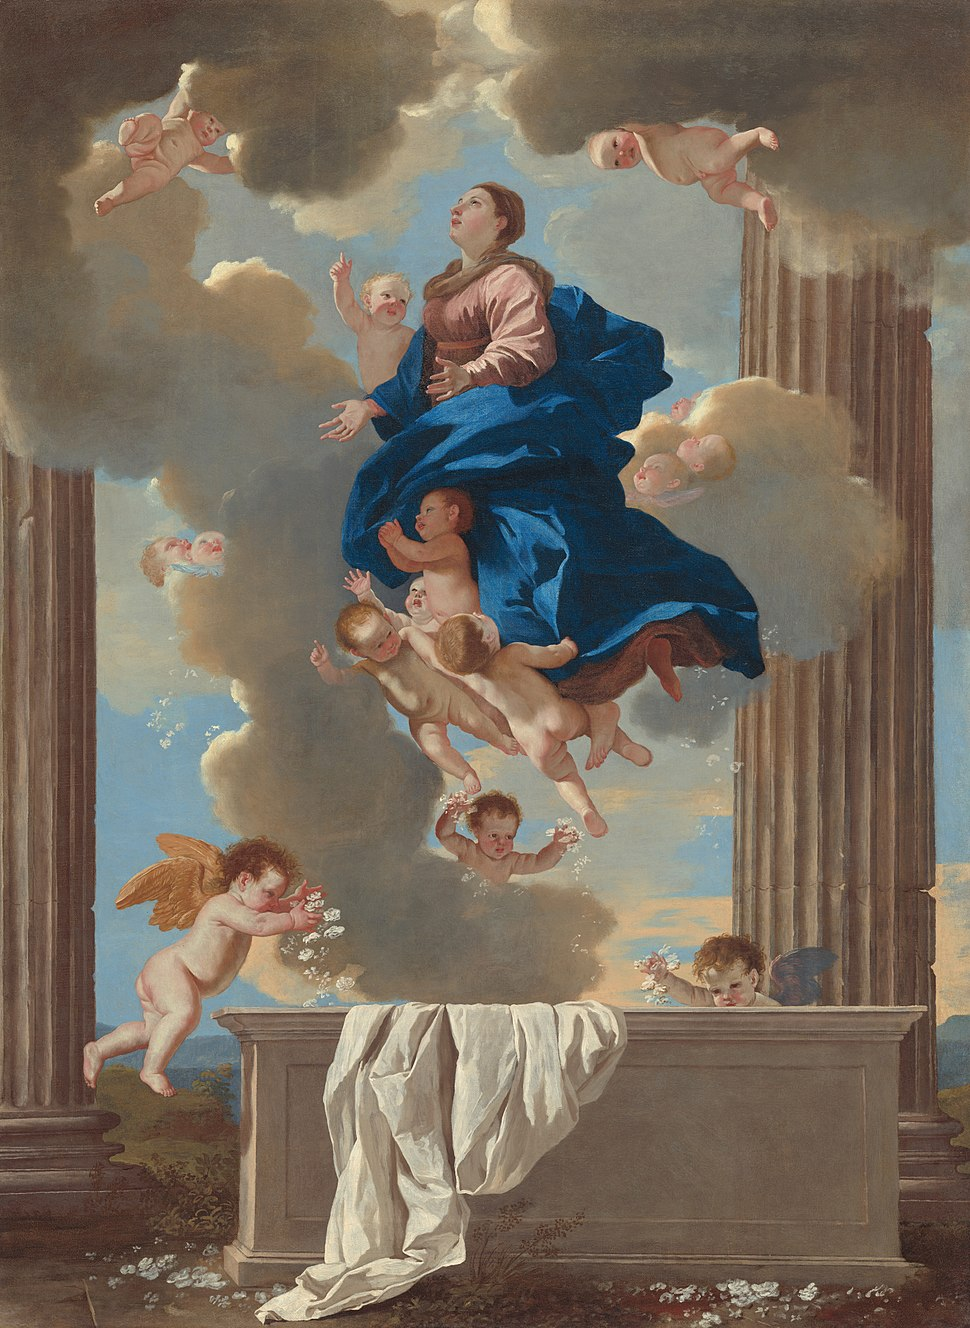 Nicolas Poussin - The Assumption of the Virgin